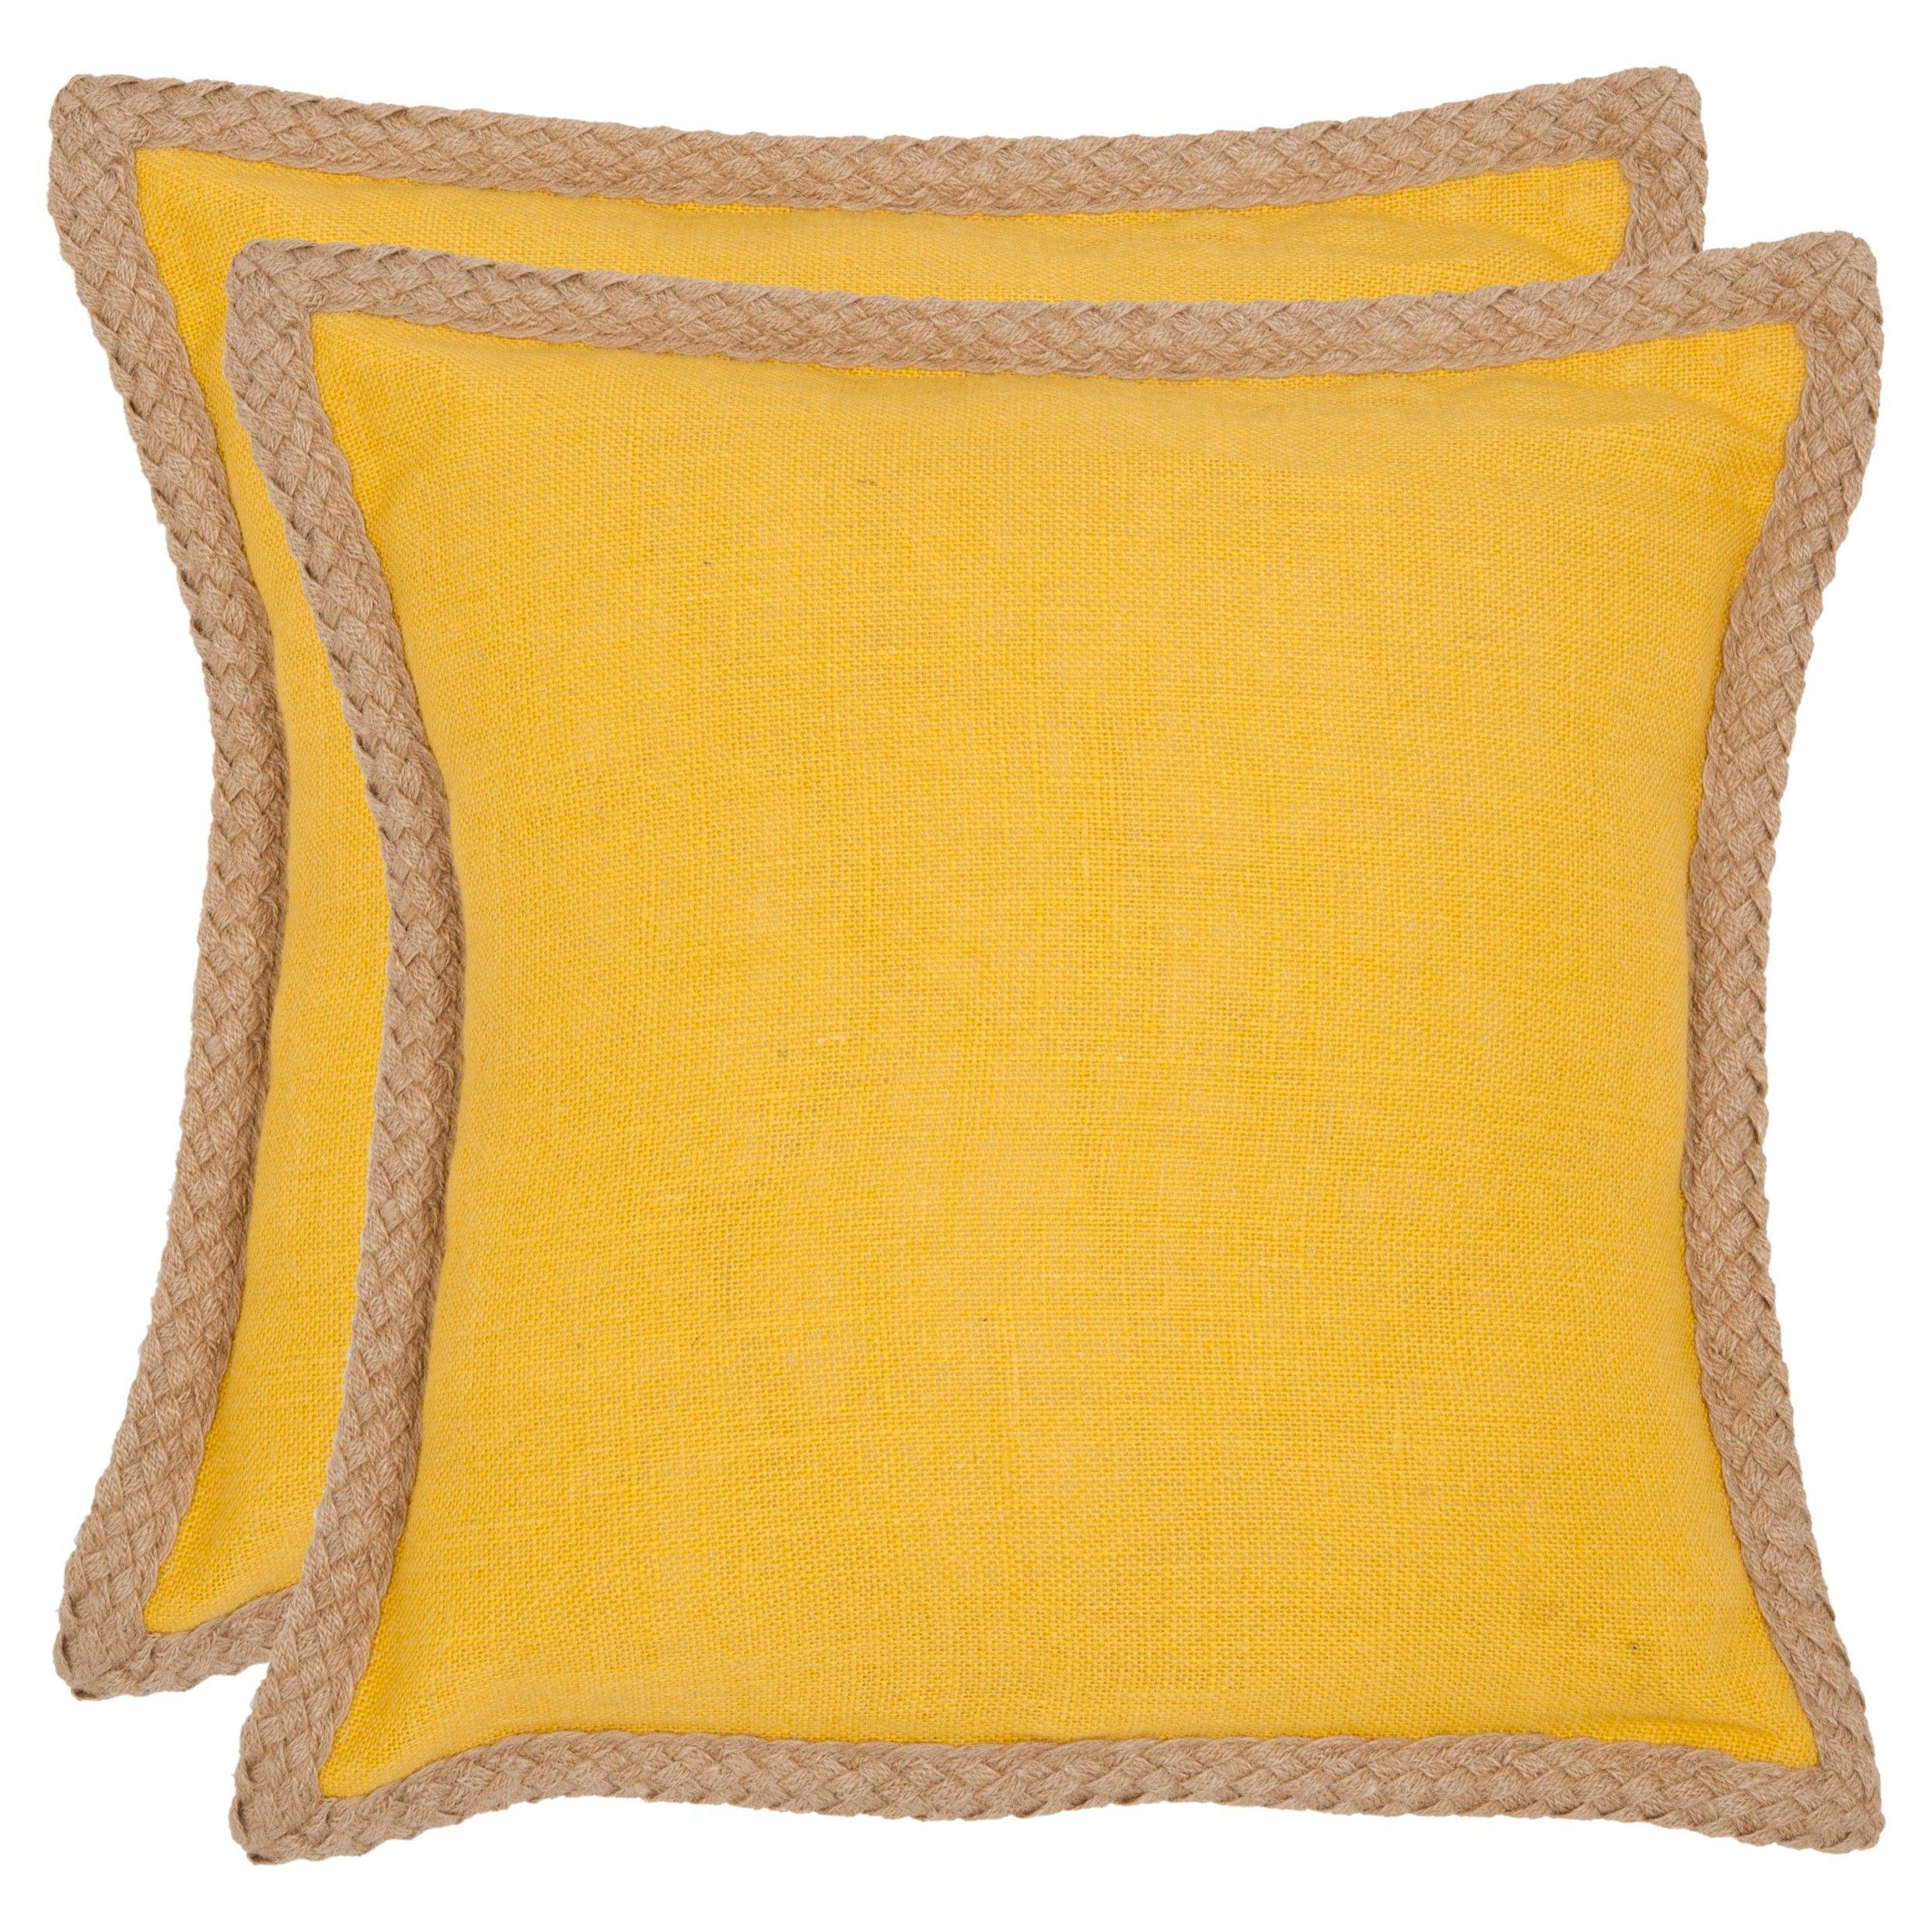 Safavieh 2 Pack Striped Jute Trim Pillow Target Throw